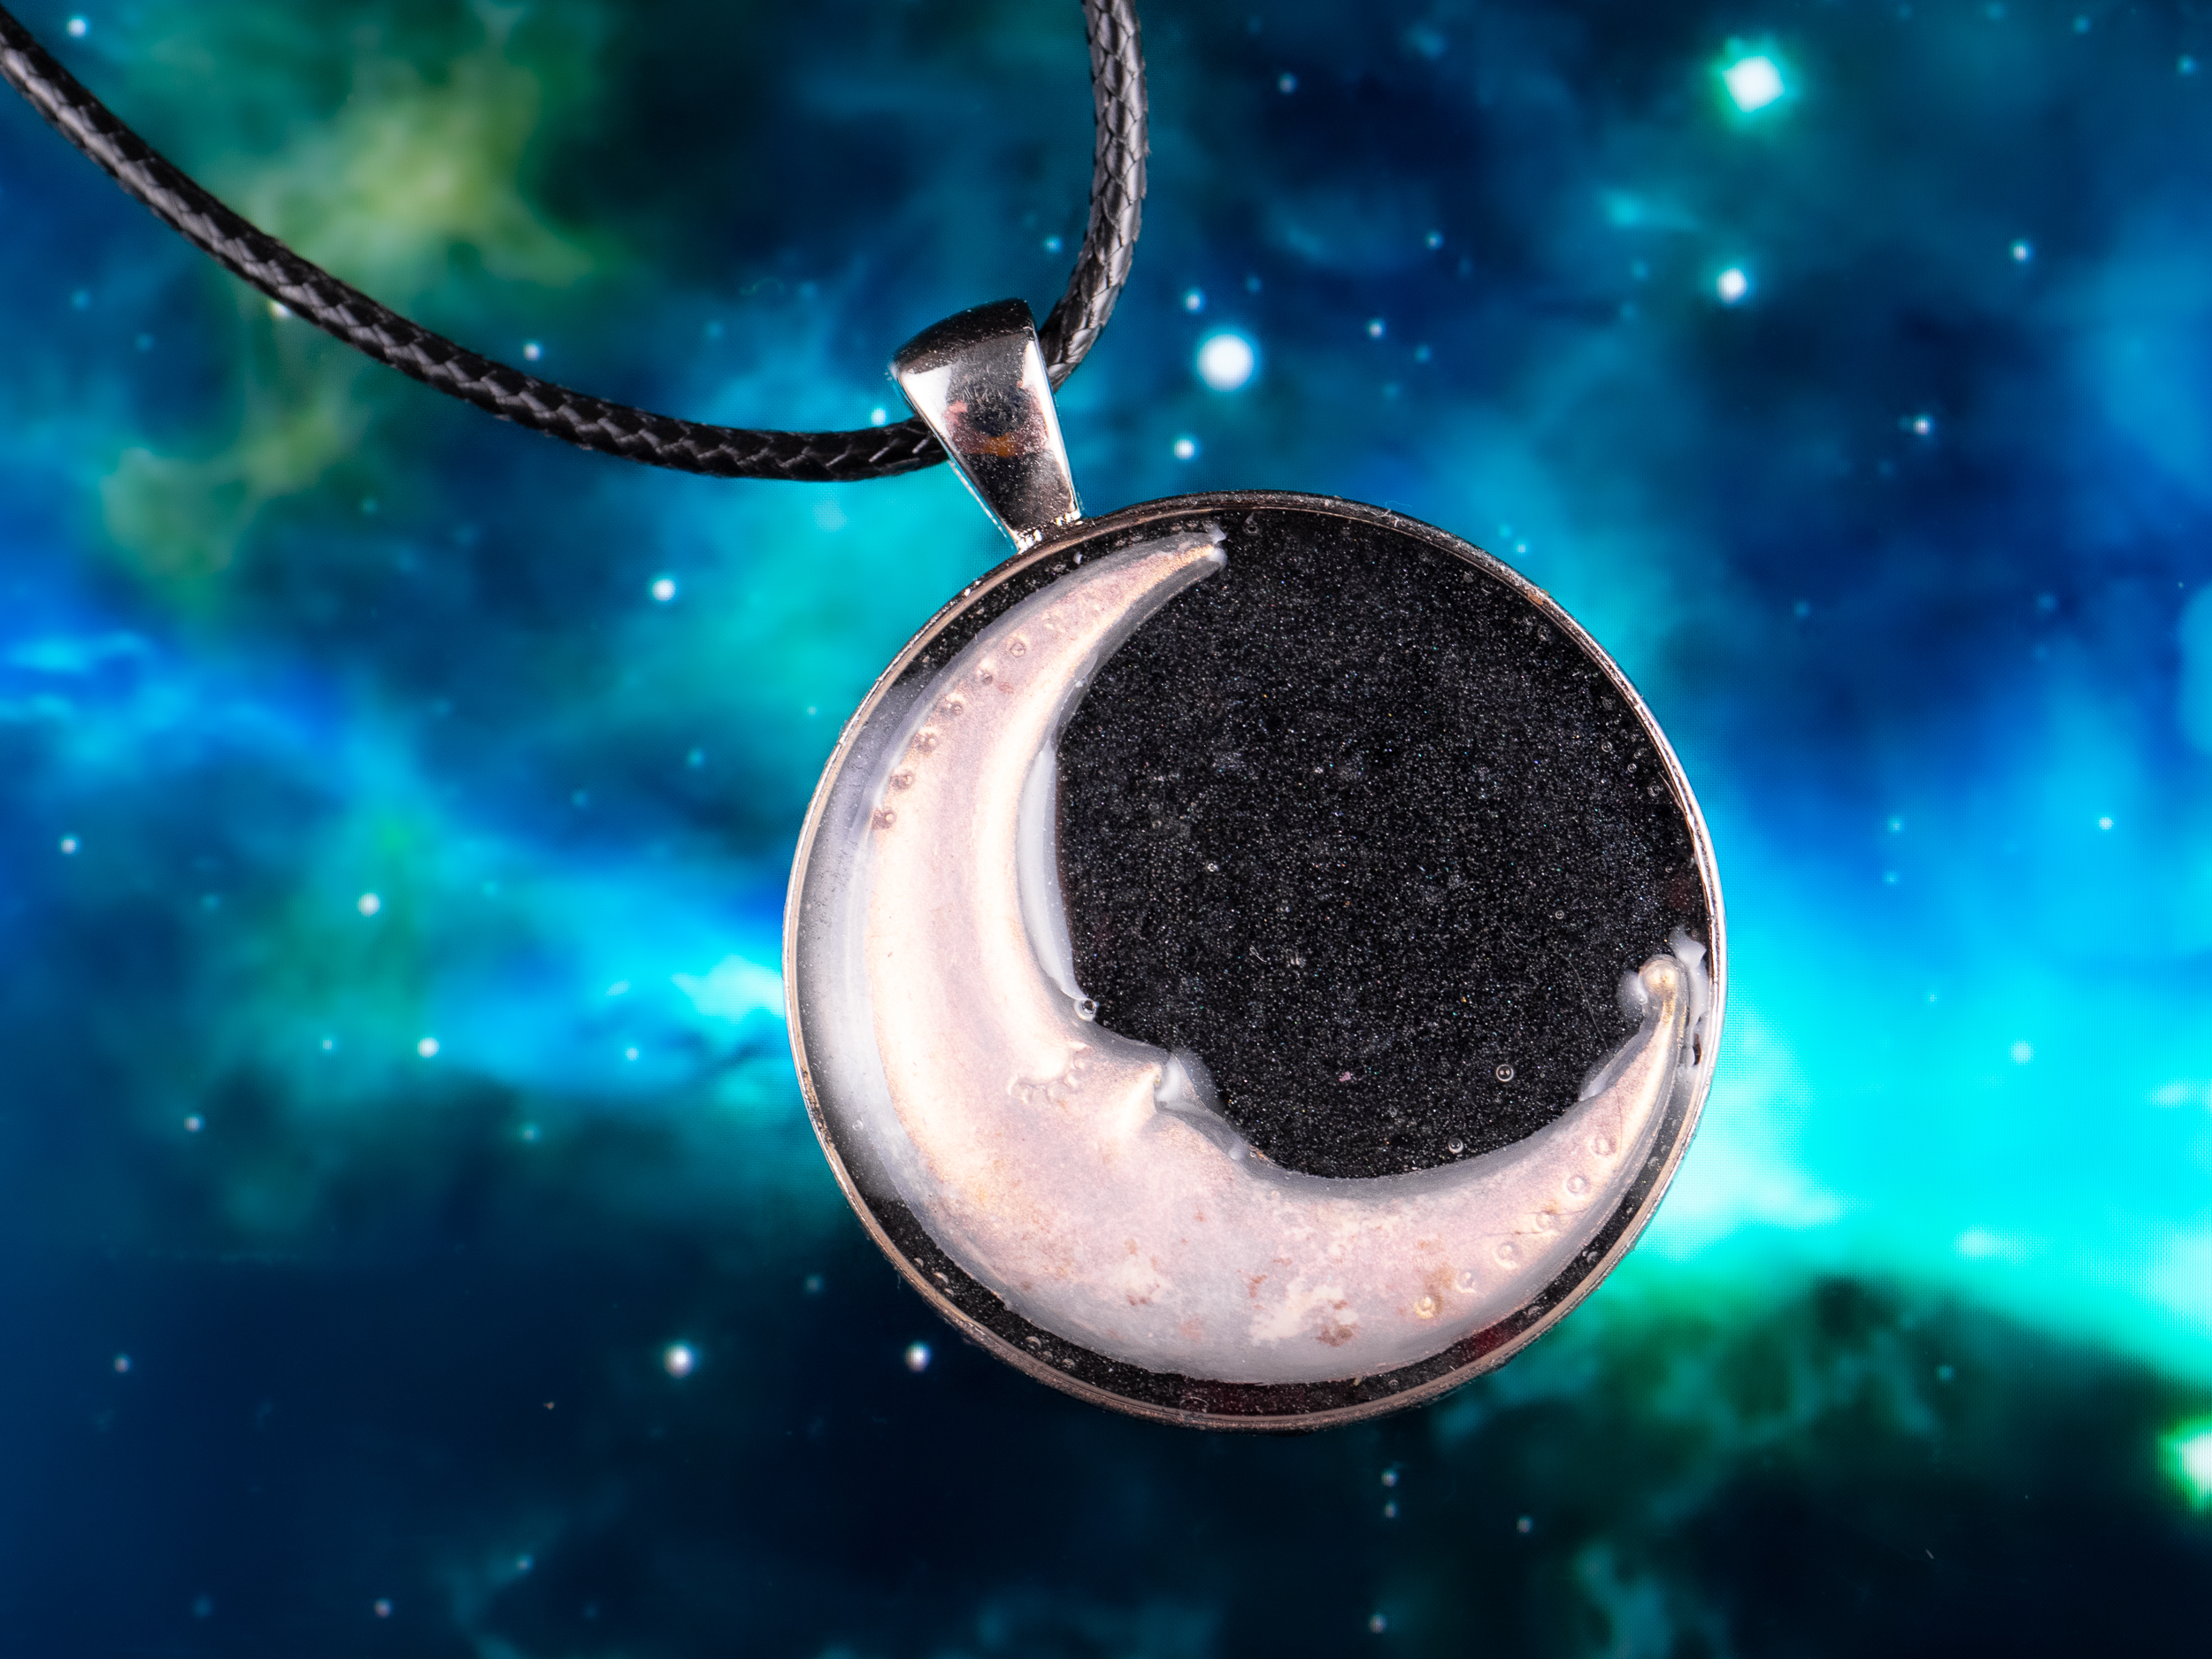 moon dust and black salt necklace